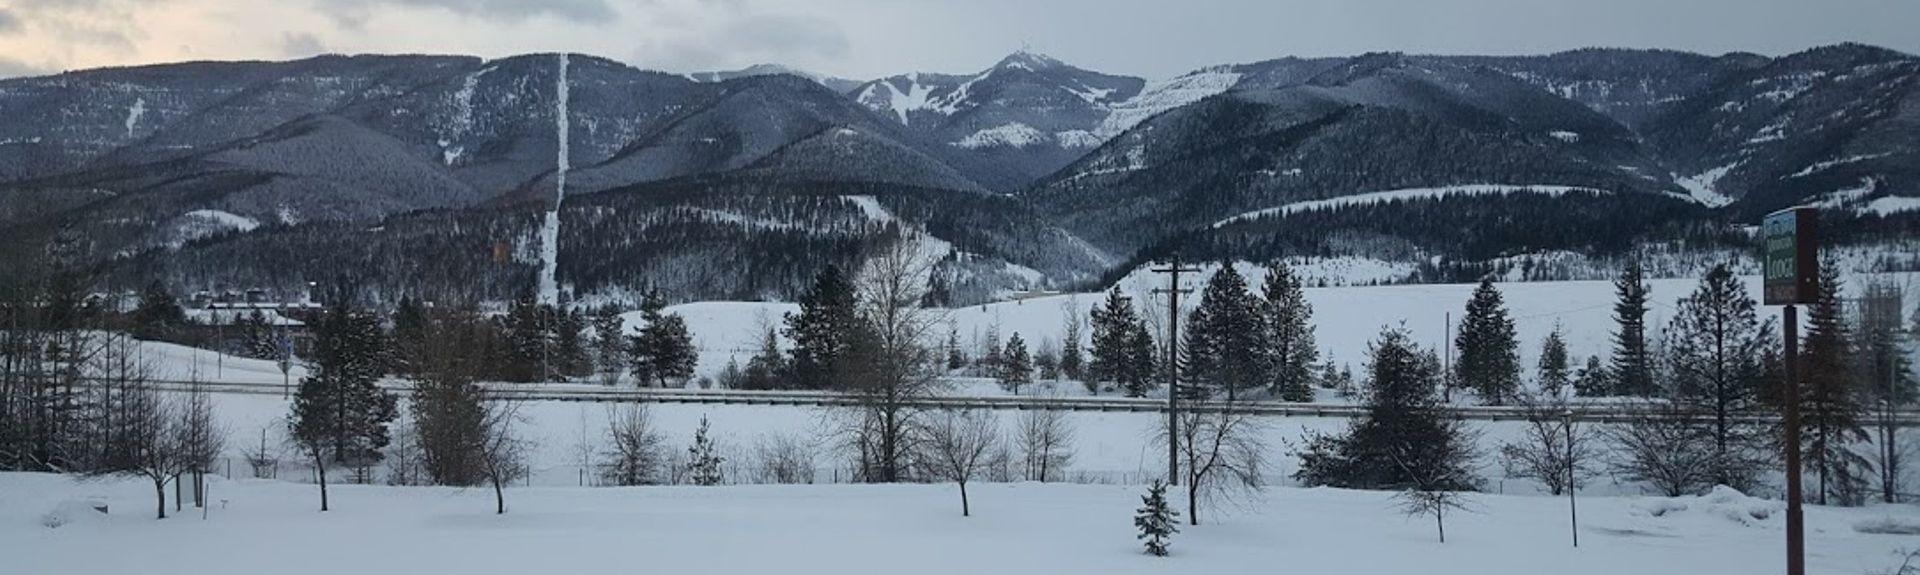 Silver Mountain Ski Resort, Kellogg, ID, USA